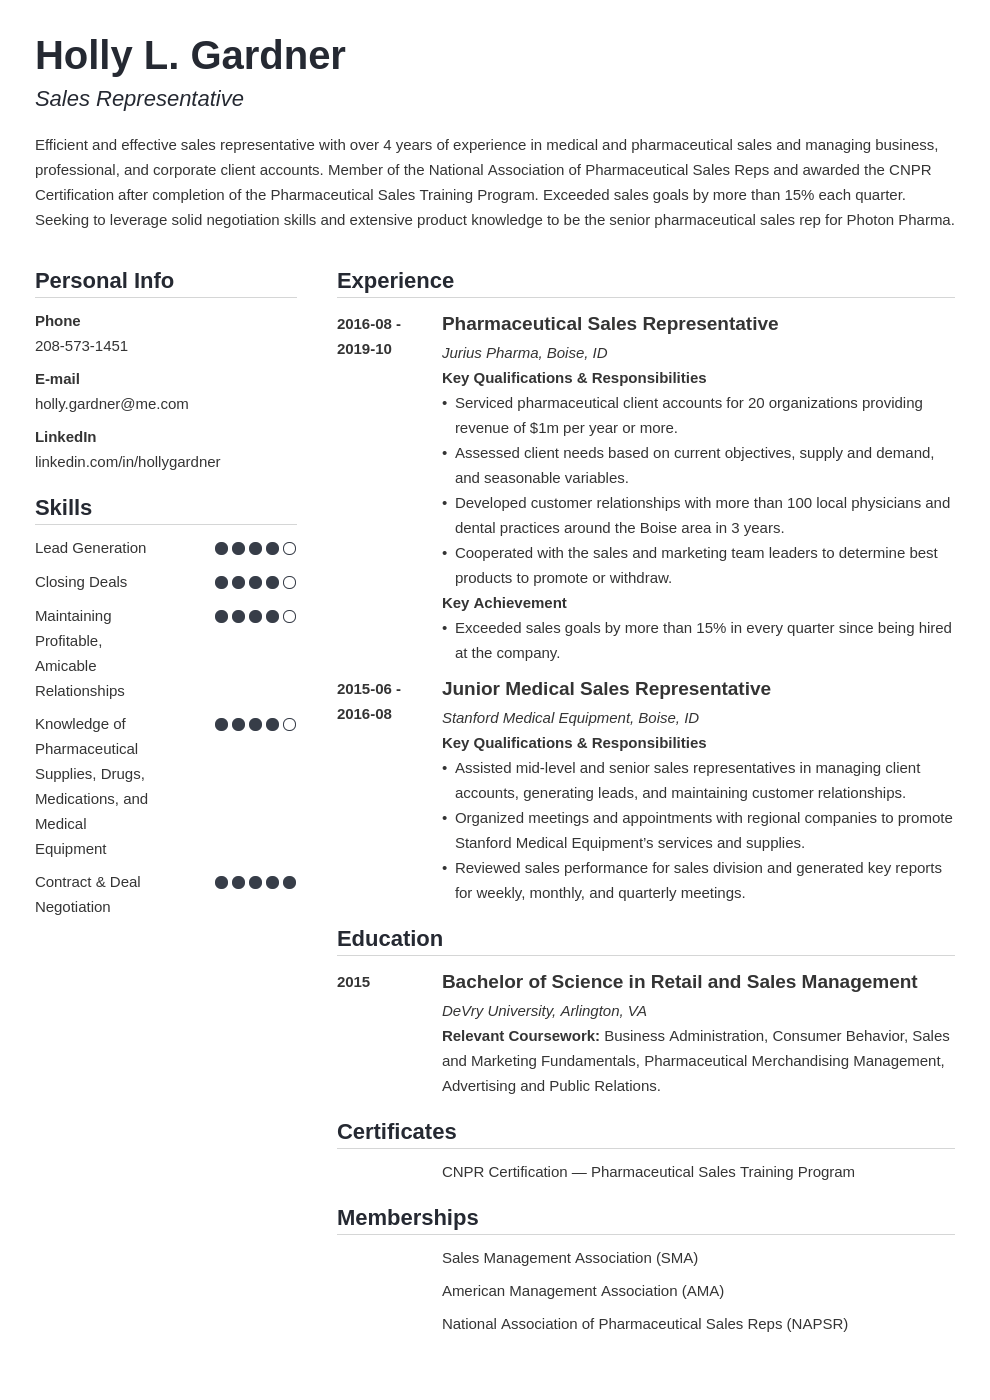 Senior Sales Manager Resume Template Sales resume, Sales